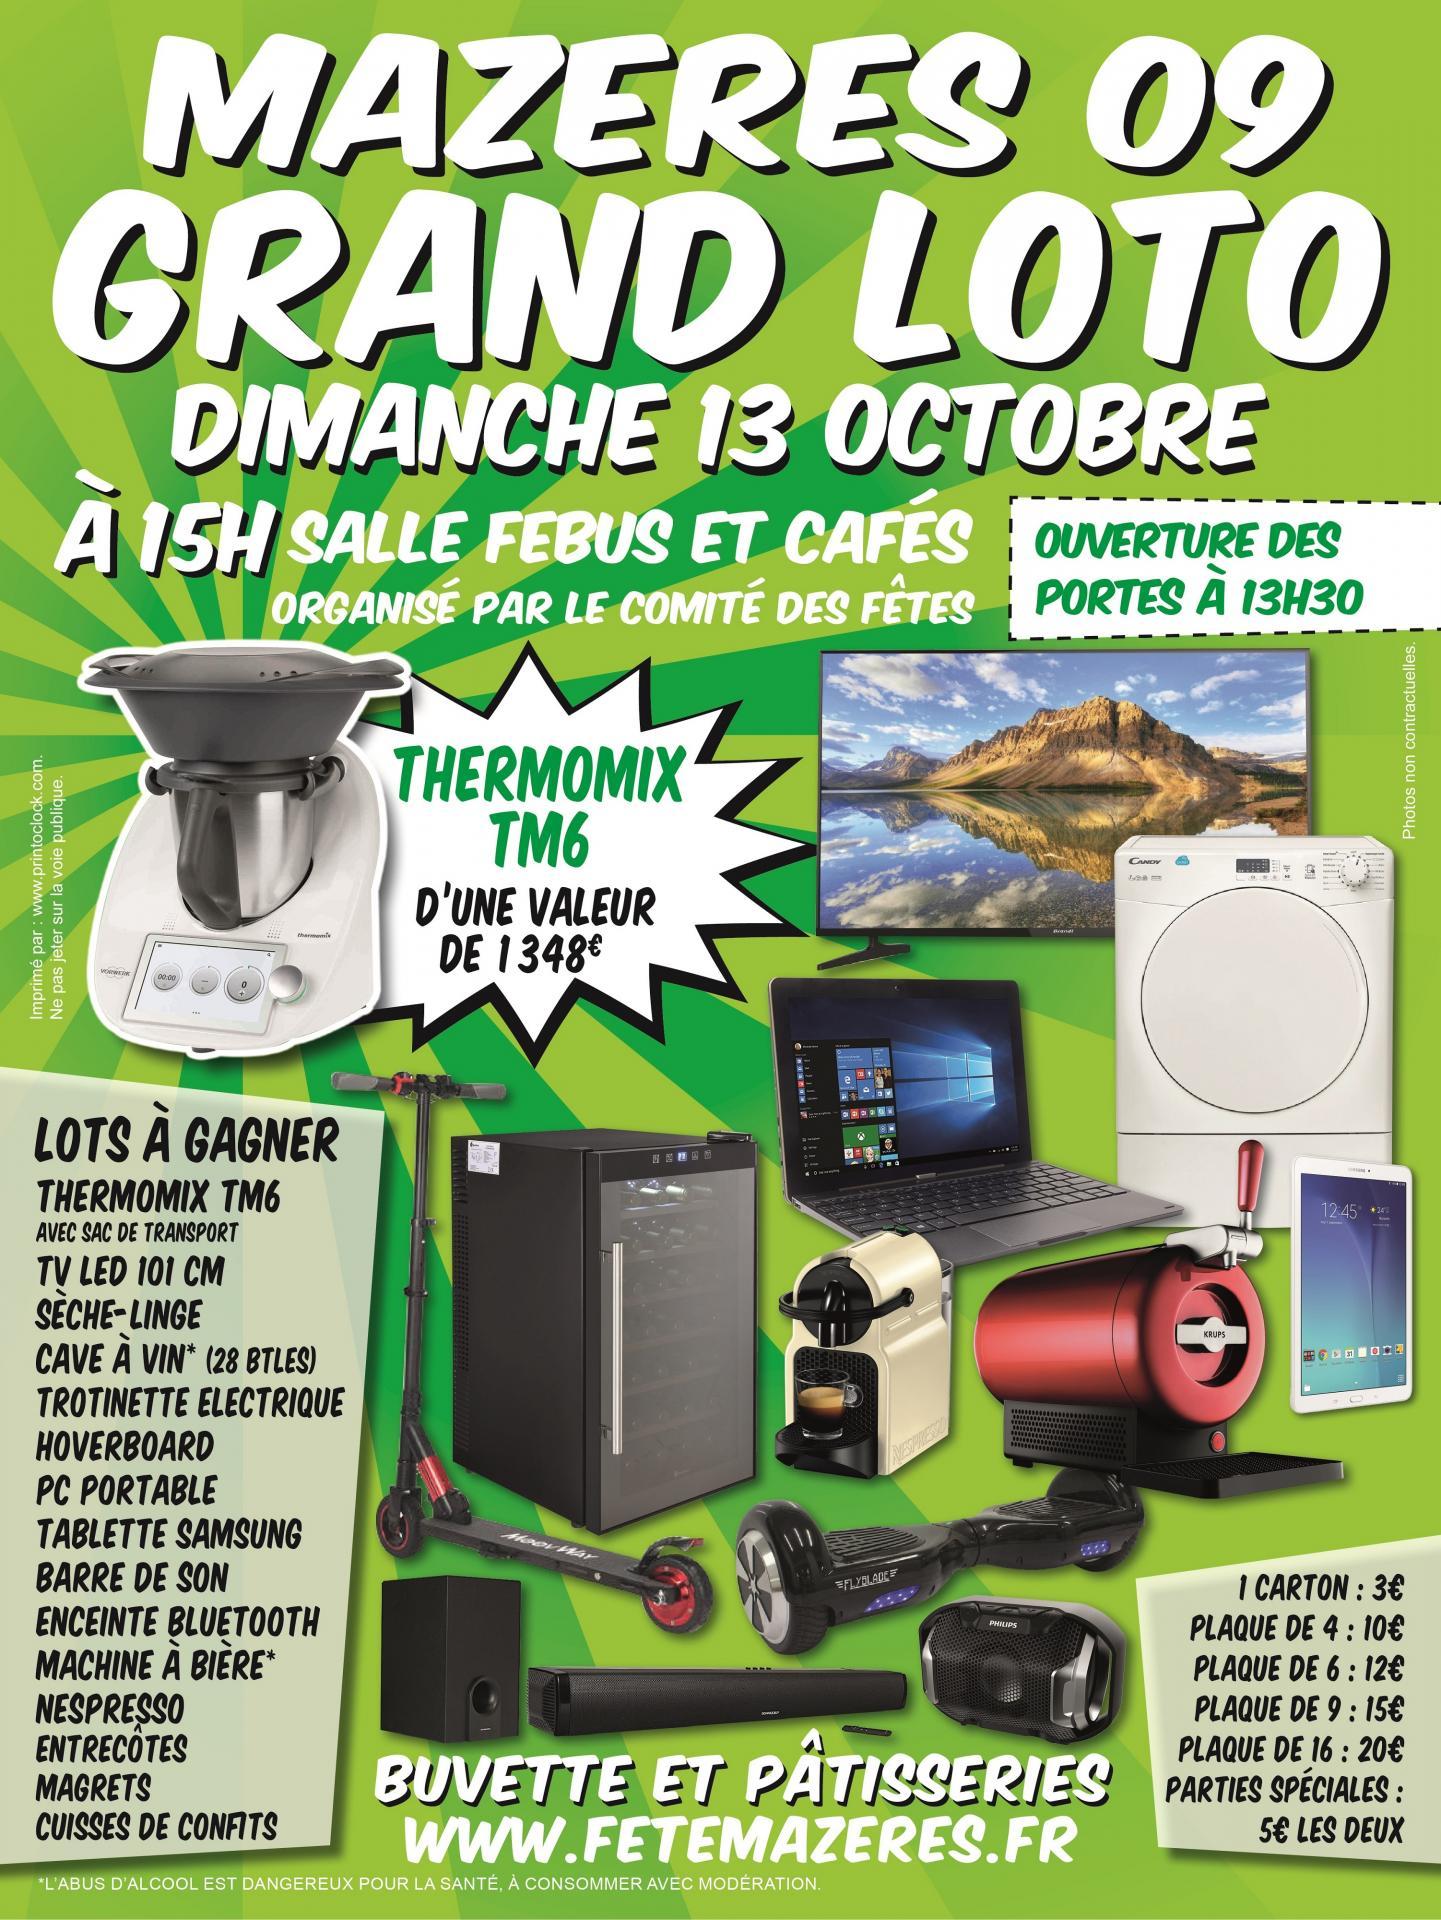 Affiche a3 cdf mazeres loto 13 octobre web